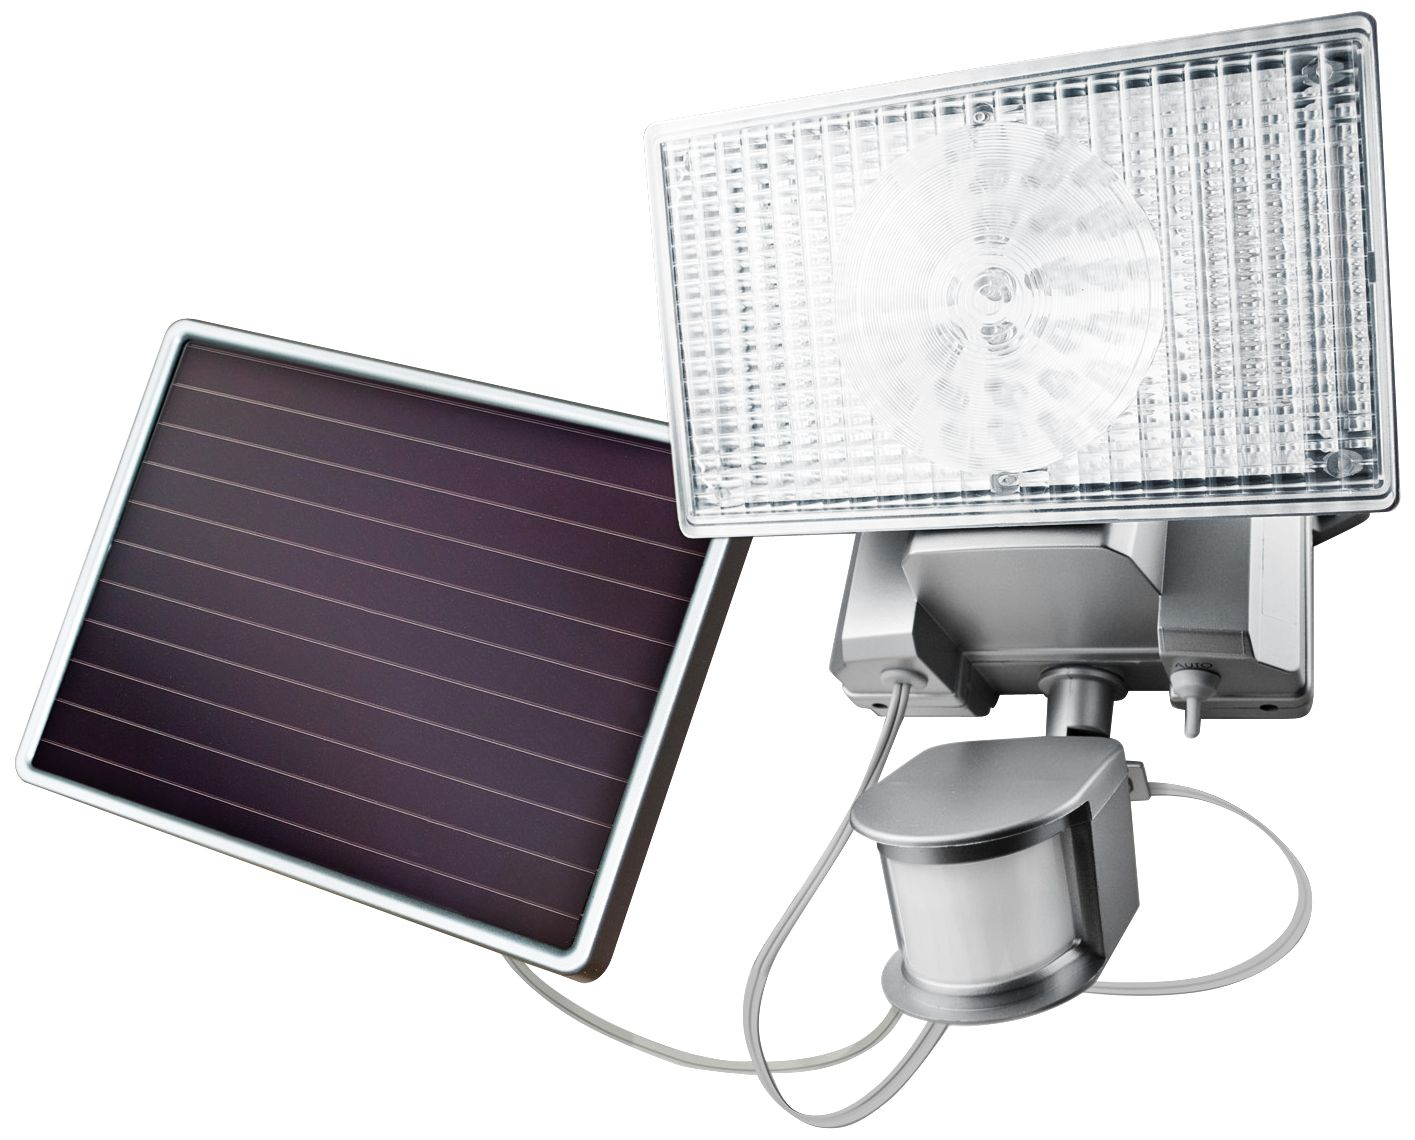 Charmant Silver Solar 100 LED Outdoor Security Flood Light